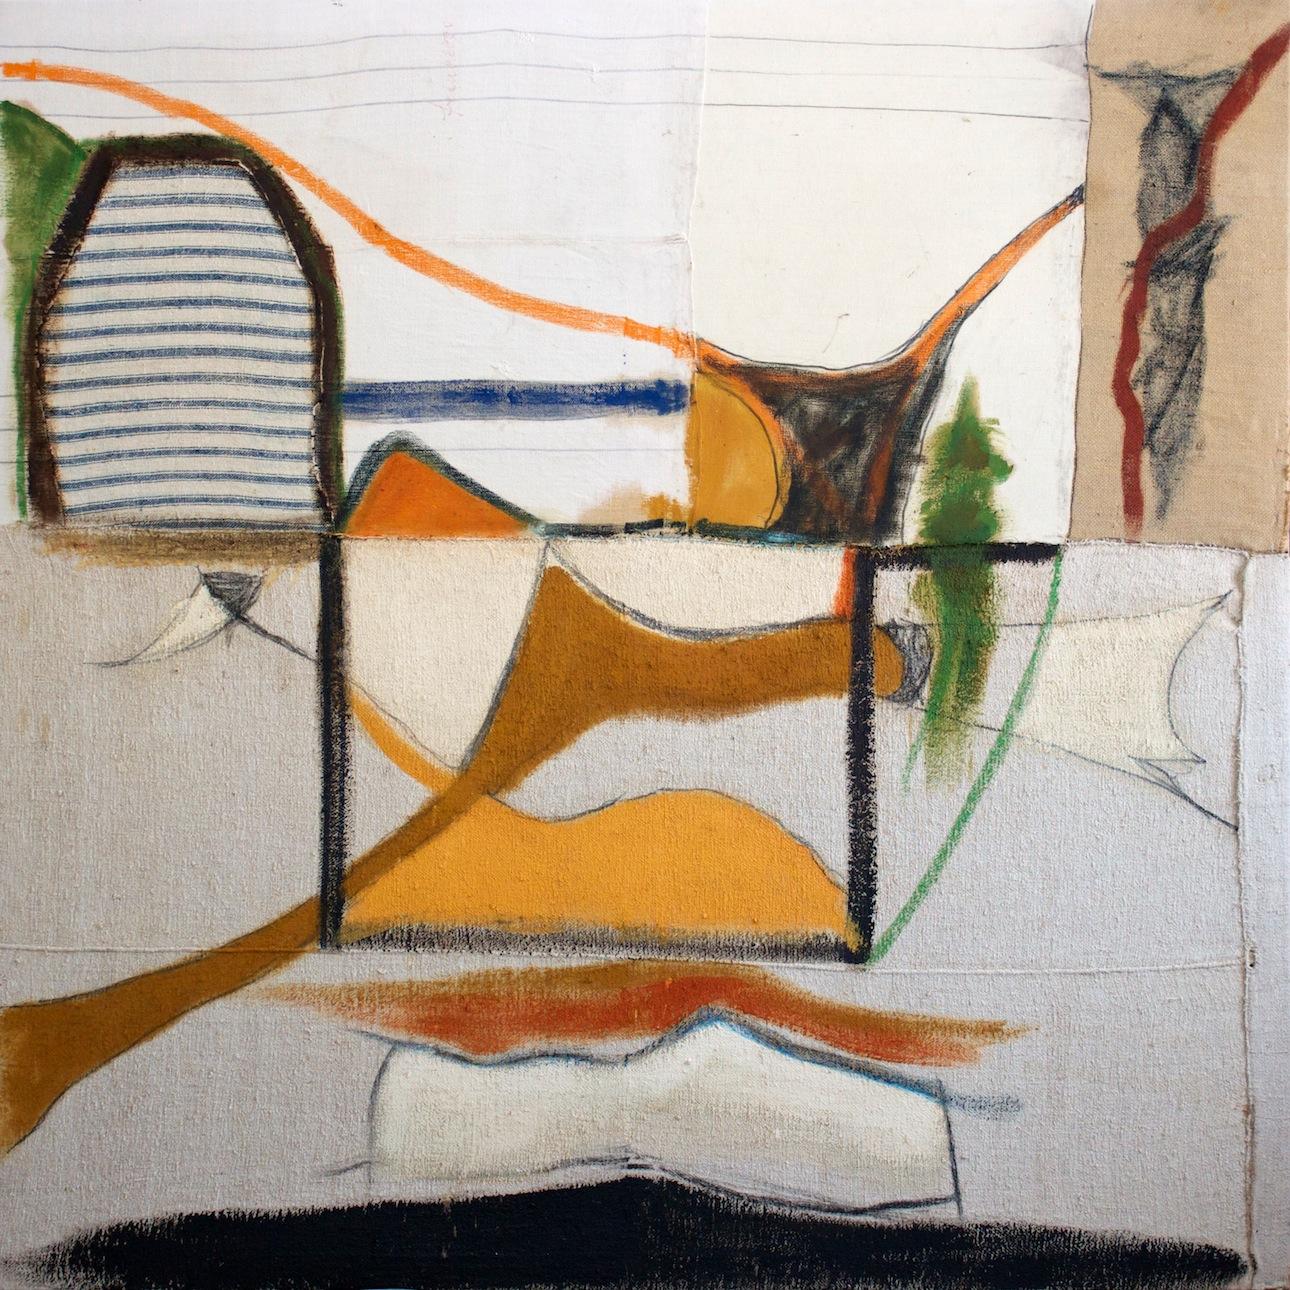 Marcello Mariani - Forma Archetipa - Oil and mixed media on canvas - 1960/70